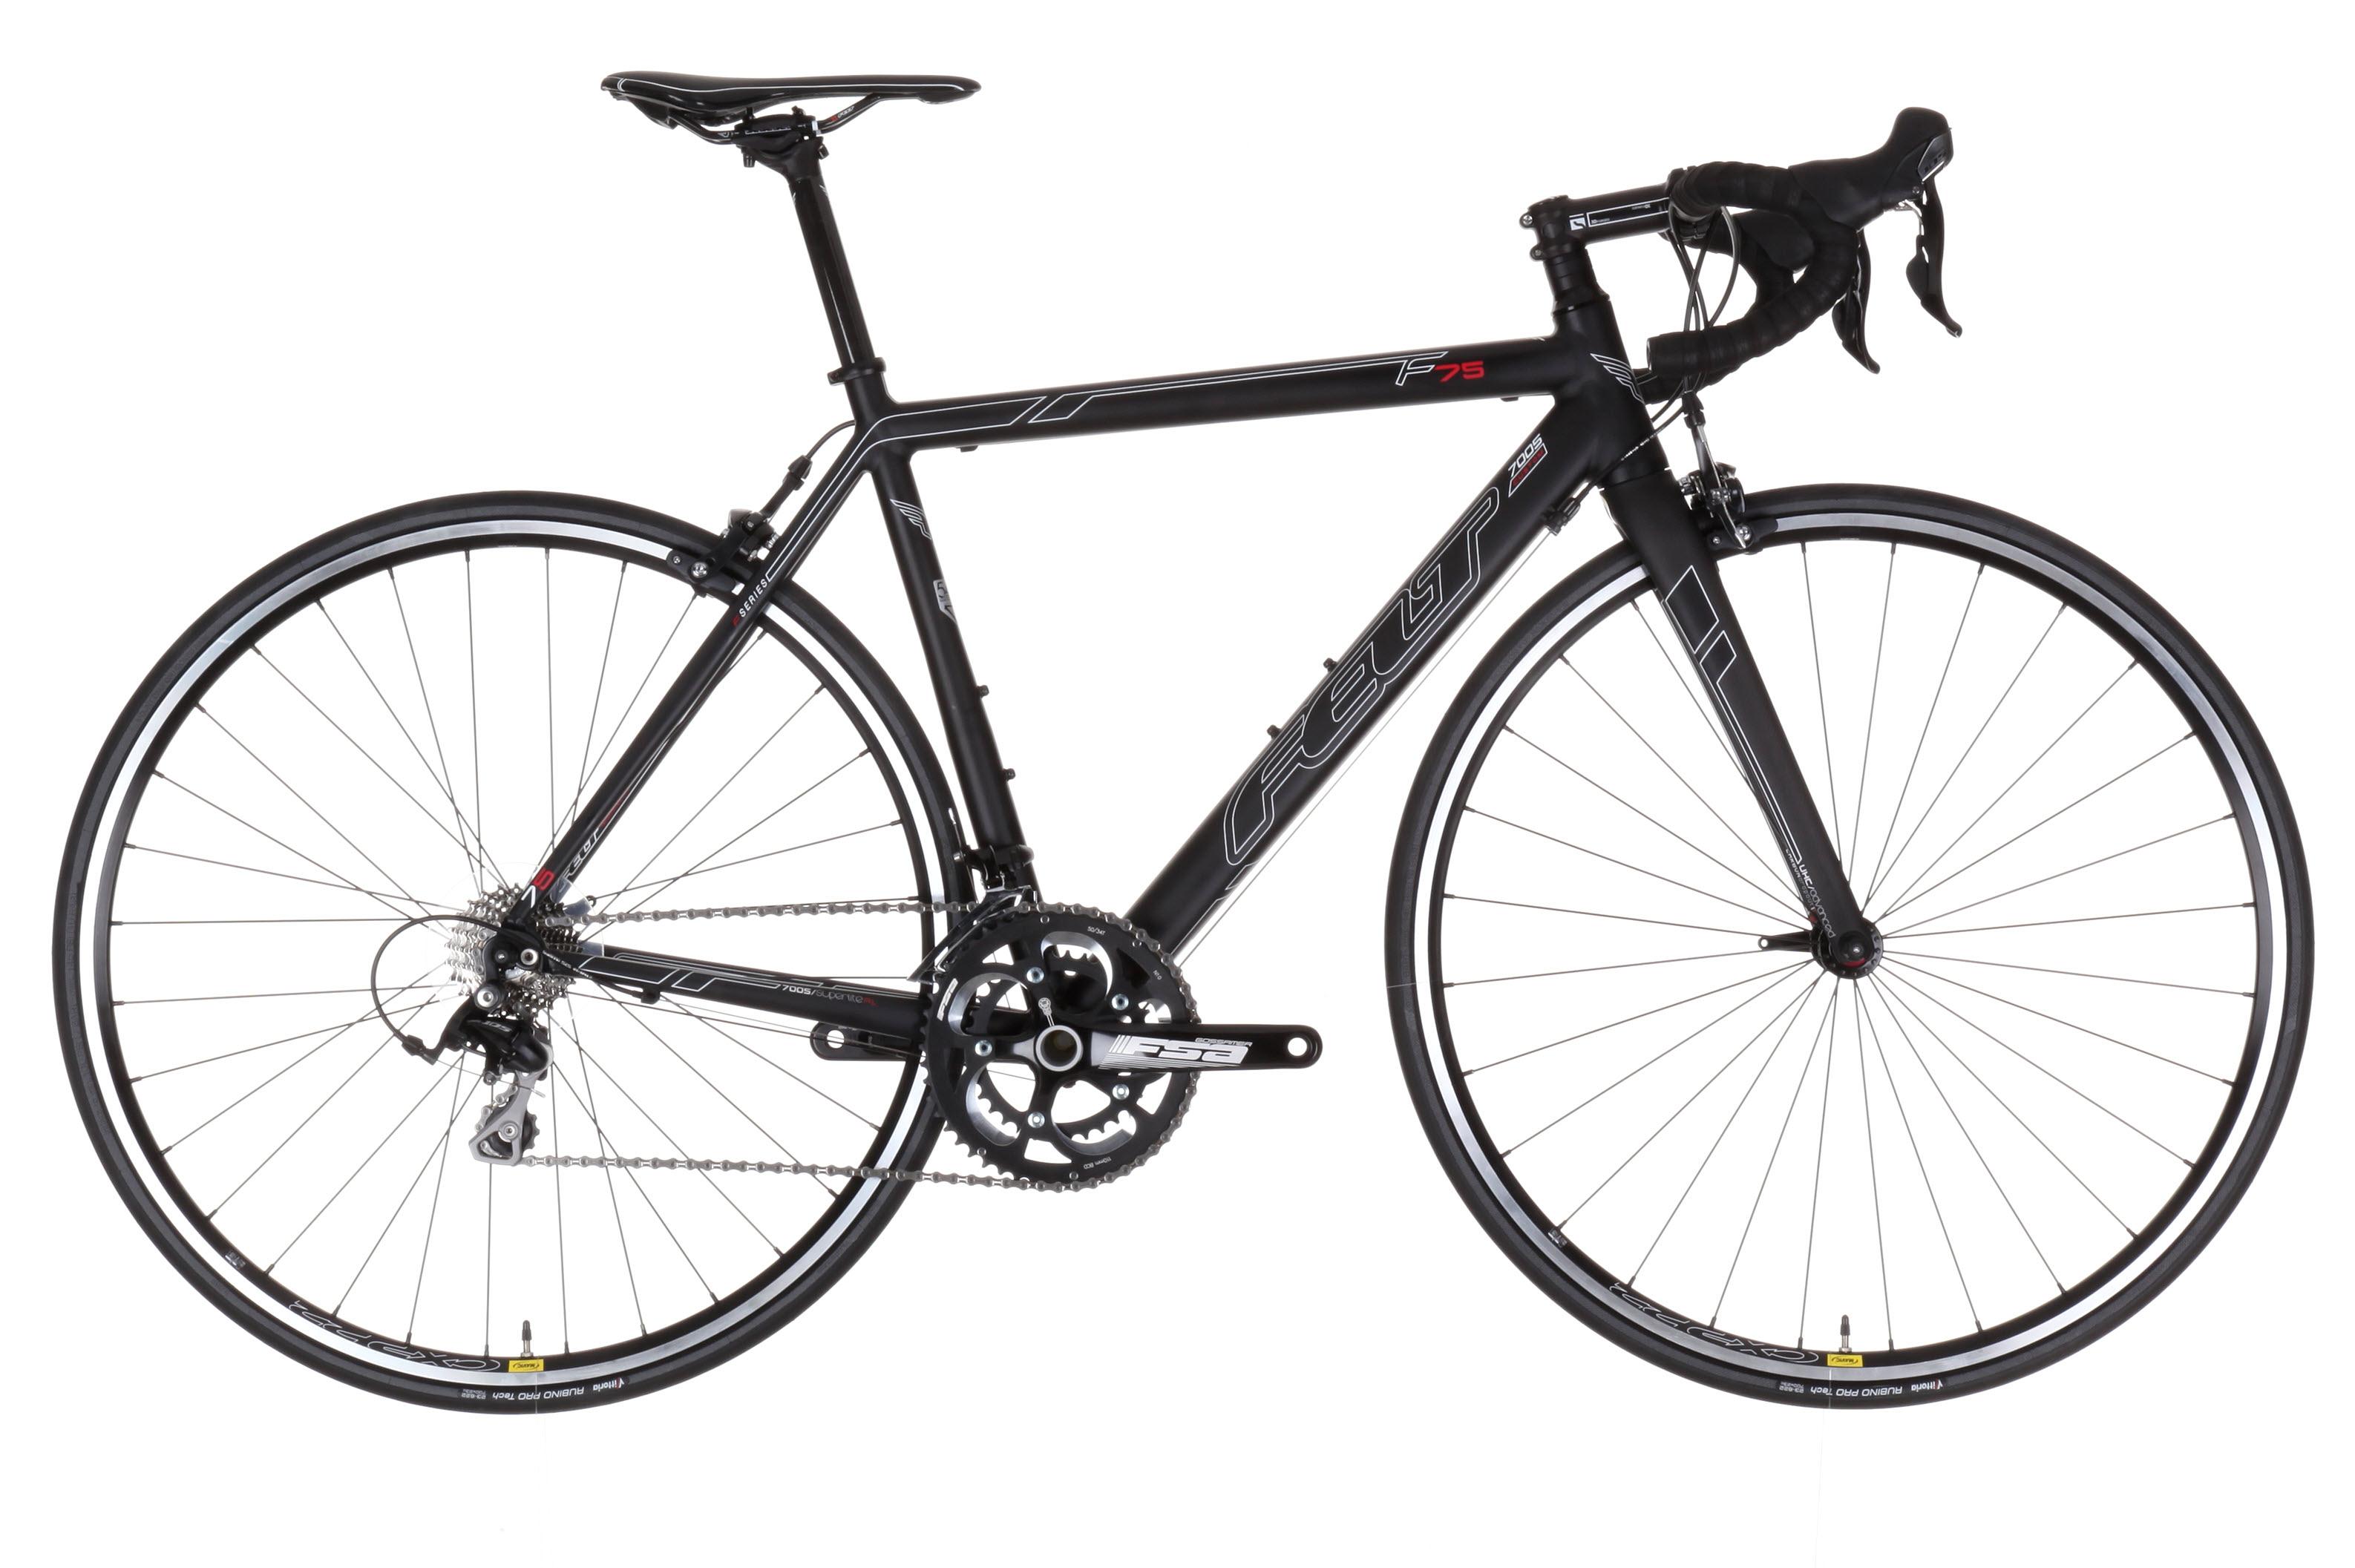 3173x2113 Bike Clip Art Vector Free 2